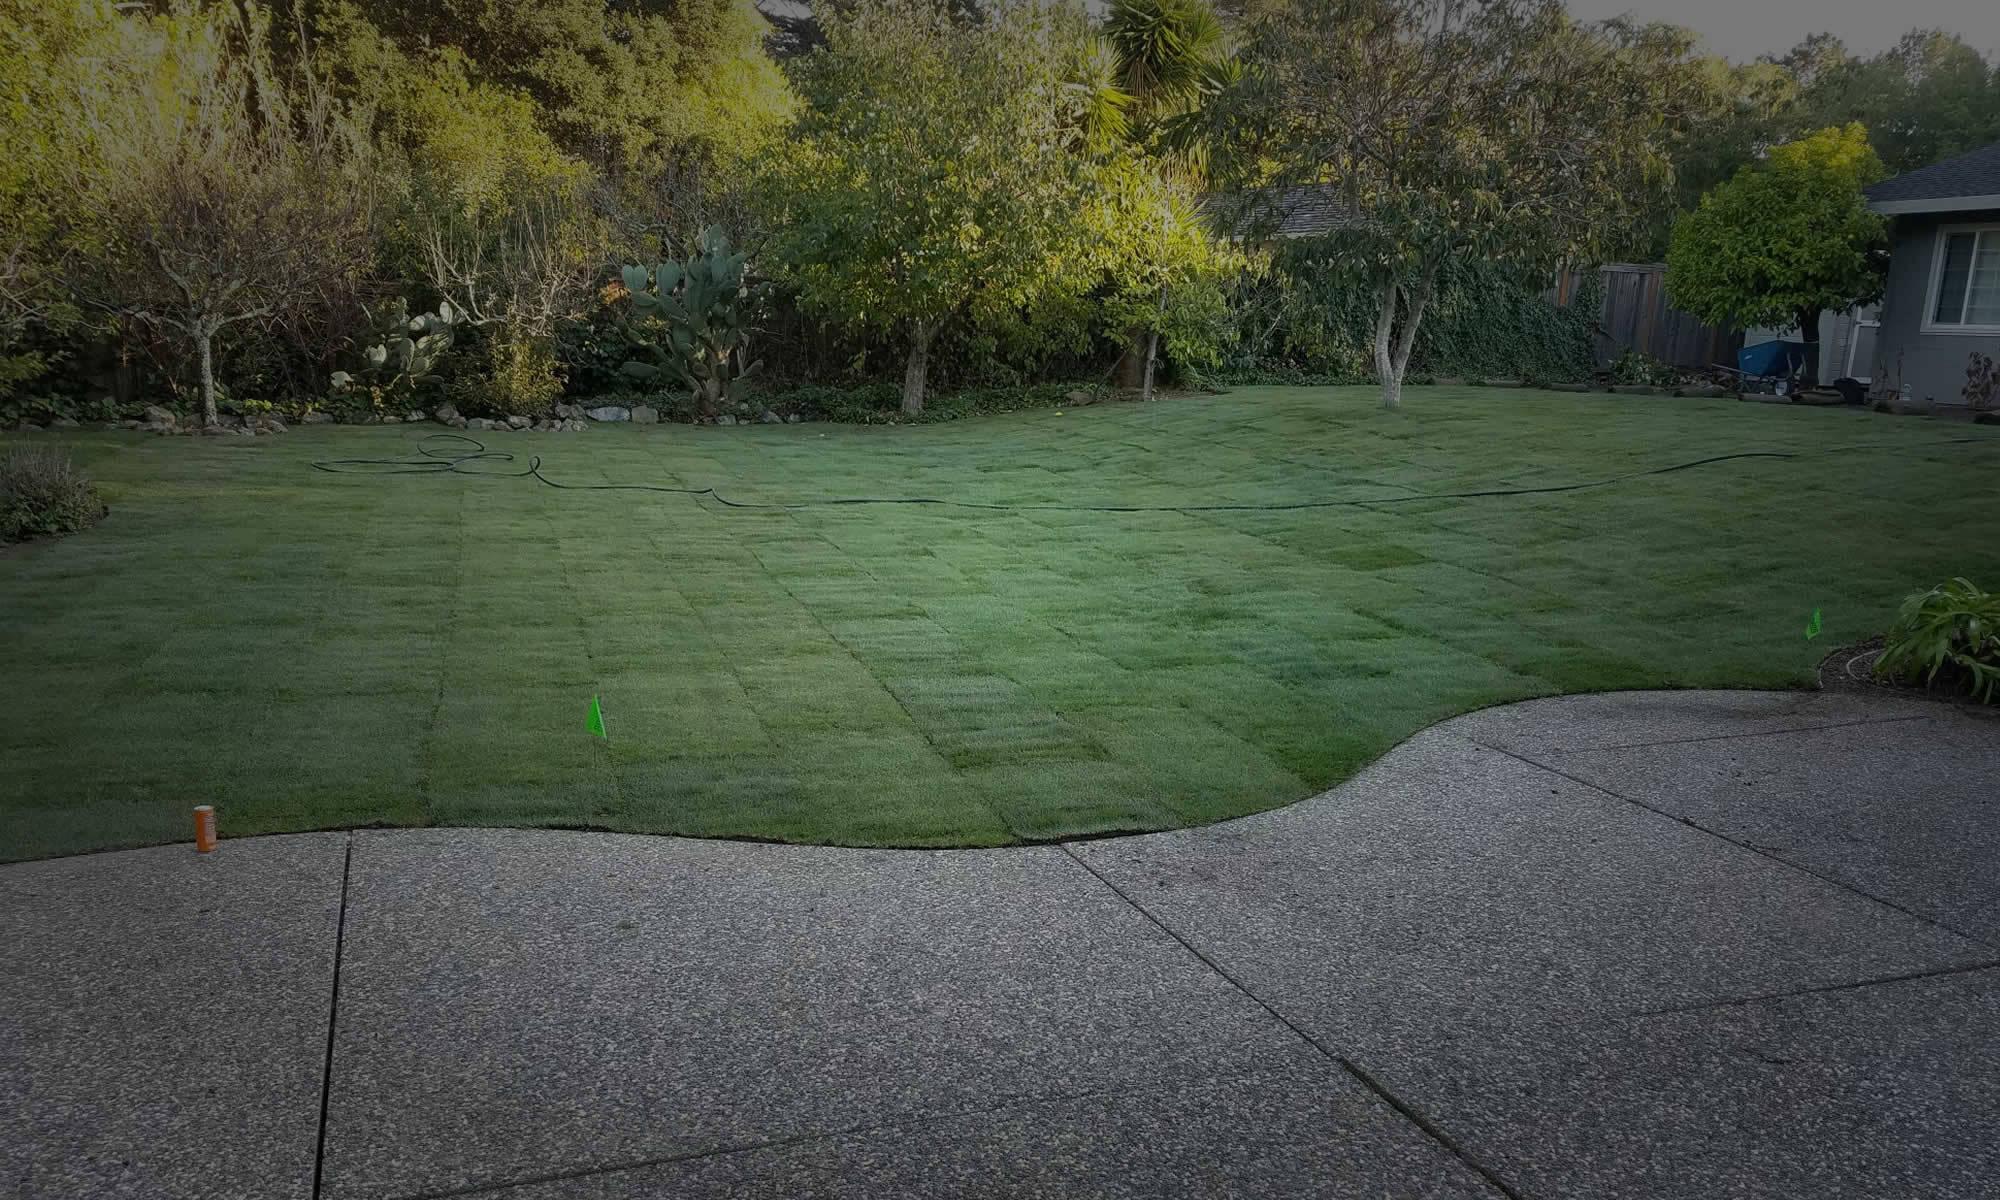 full-garden-service-burlingame-sl3-2000x1200